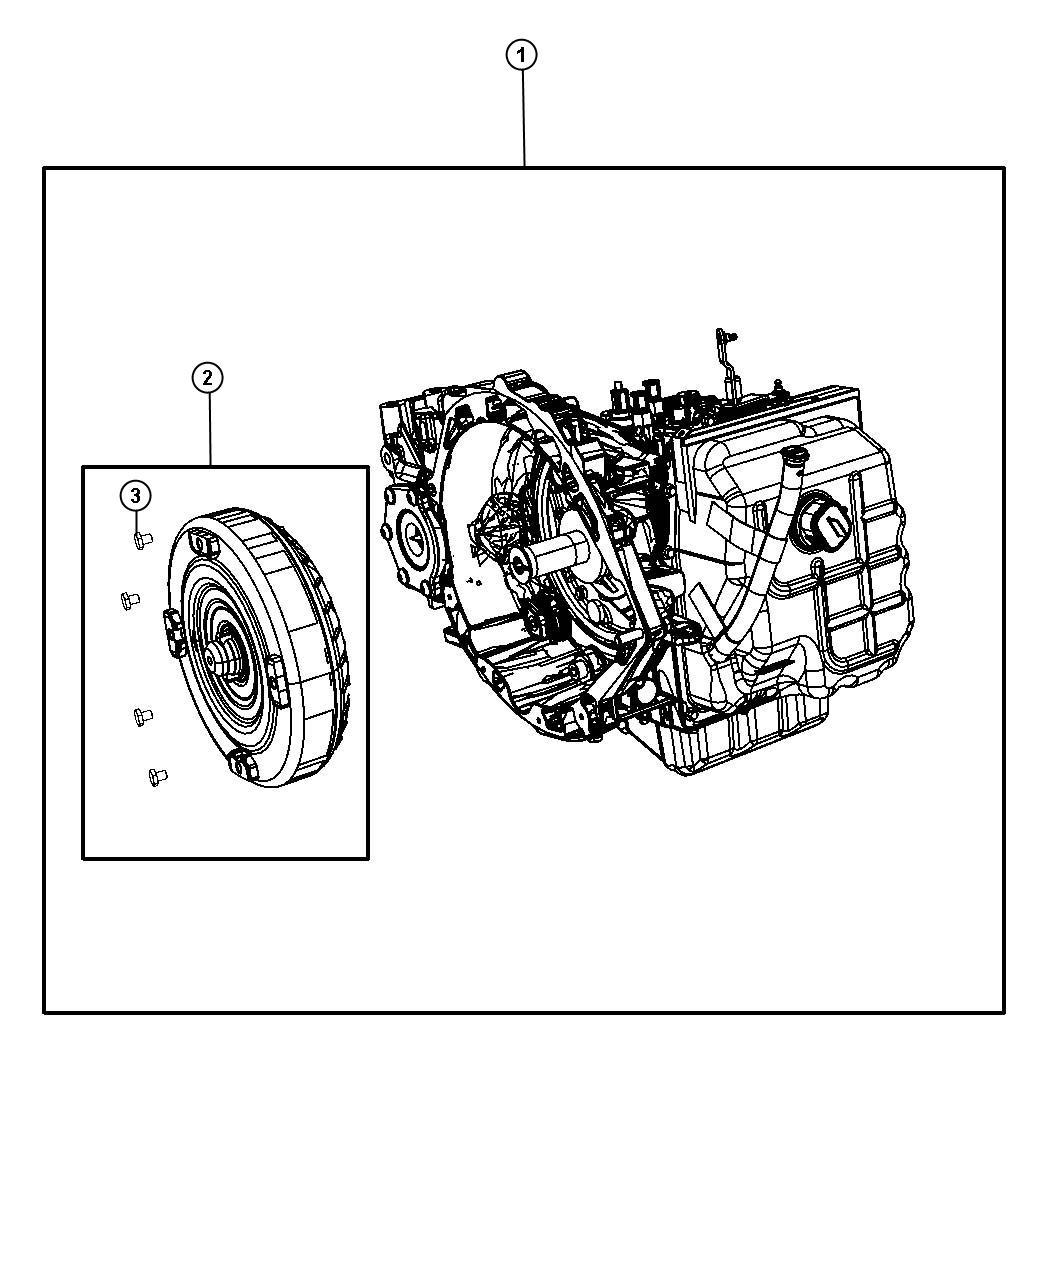 Dodge Avenger Transmission Kit With Torque Converter